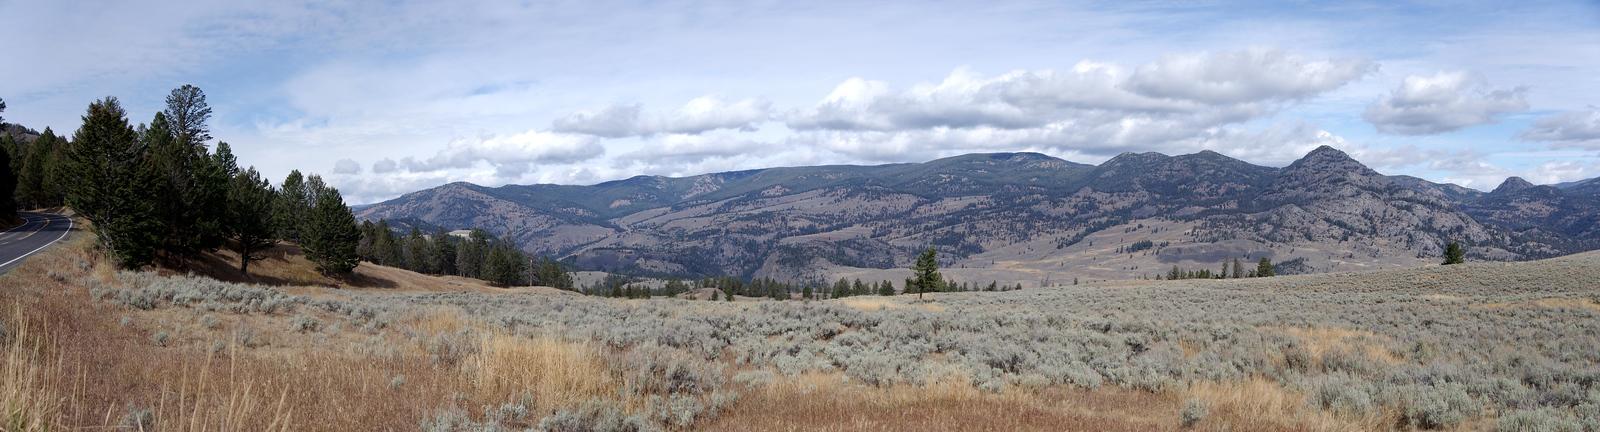 Northern Yellowstone NP